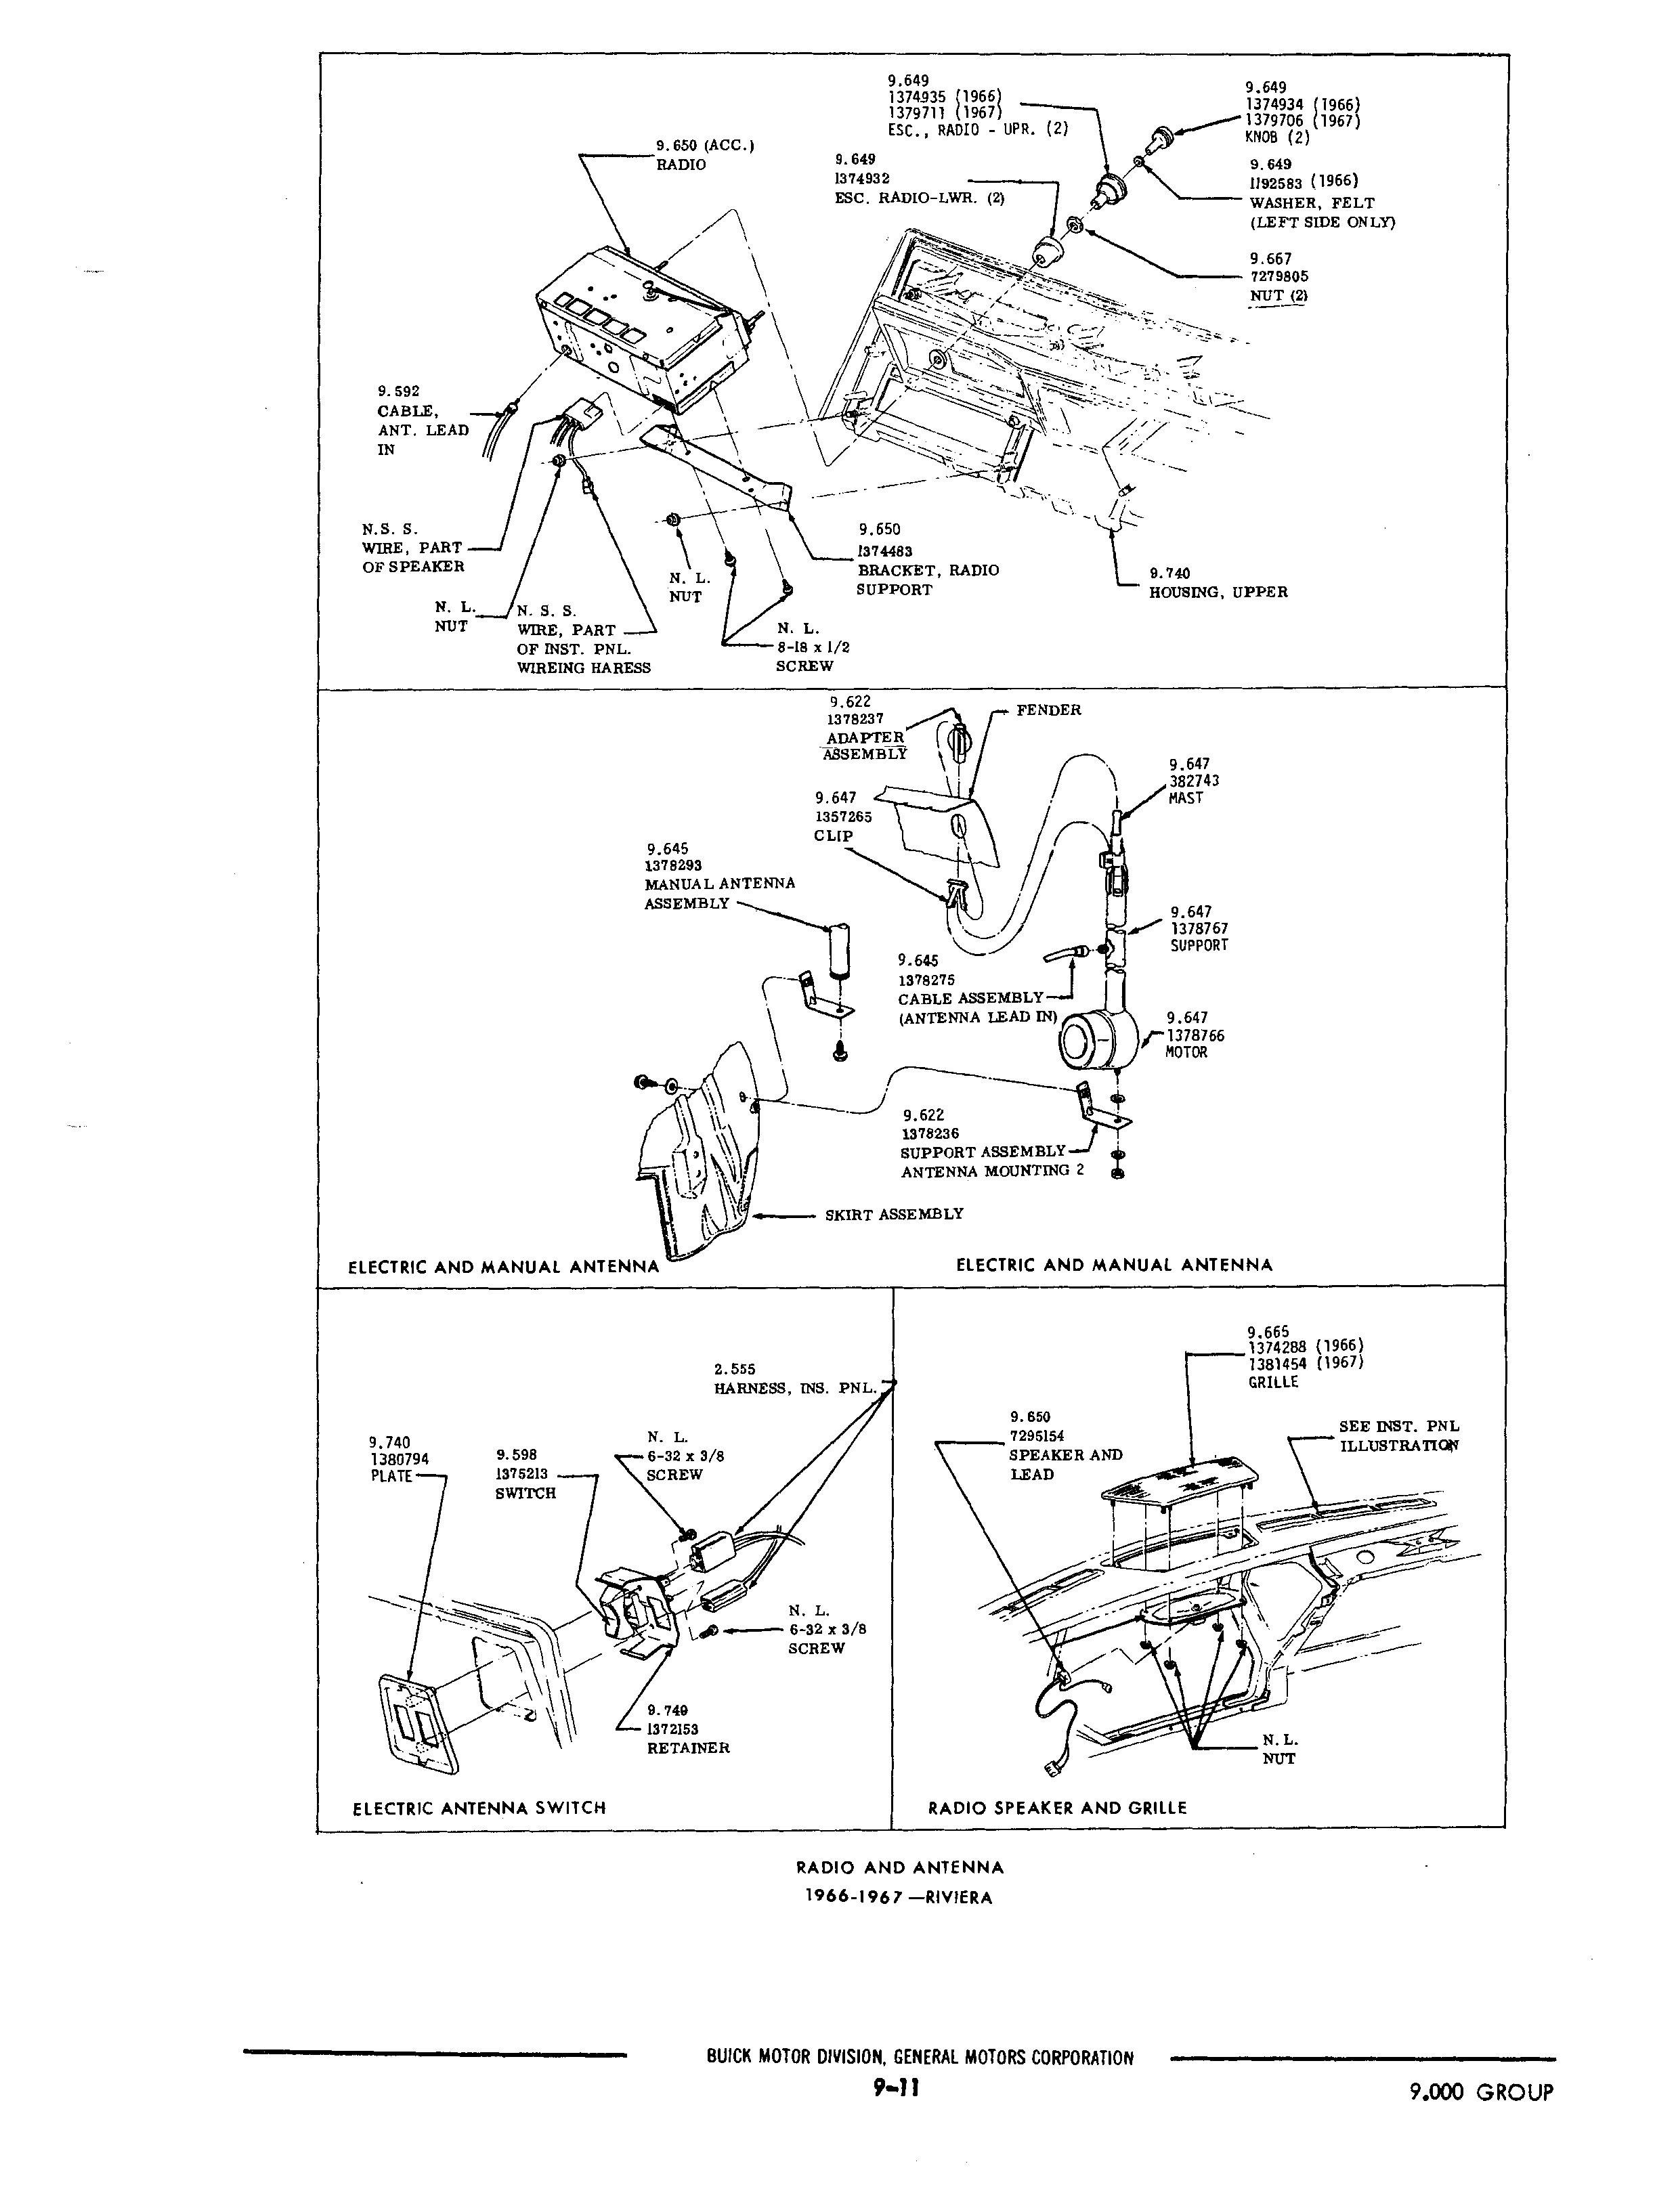 mitsubishi wiring diagrams tractor d2000ii electrical wiring diagrams  international tractor wiring diagram mitsubishi tractor parts catalog